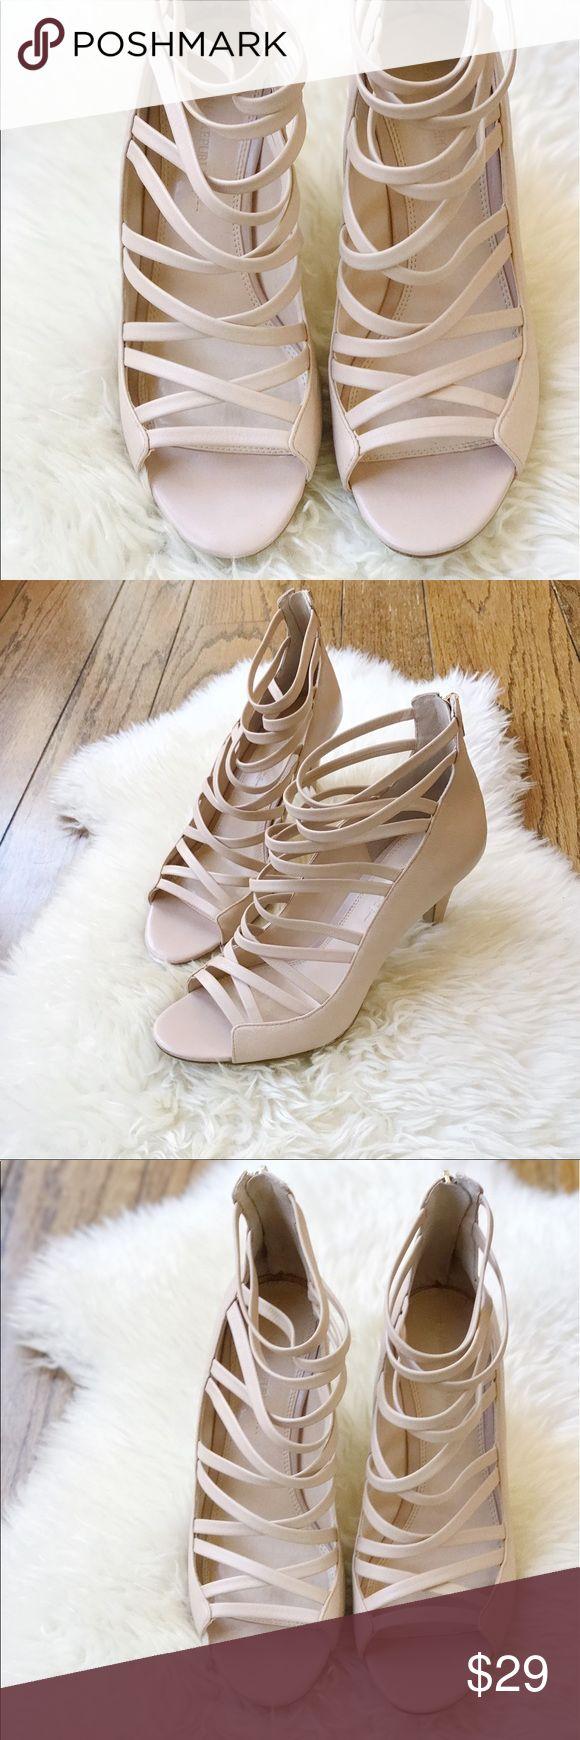 Nude banana republic heels Nude strappy cage heels from banana republic. Excellent condition. Banana Republic Shoes Heels